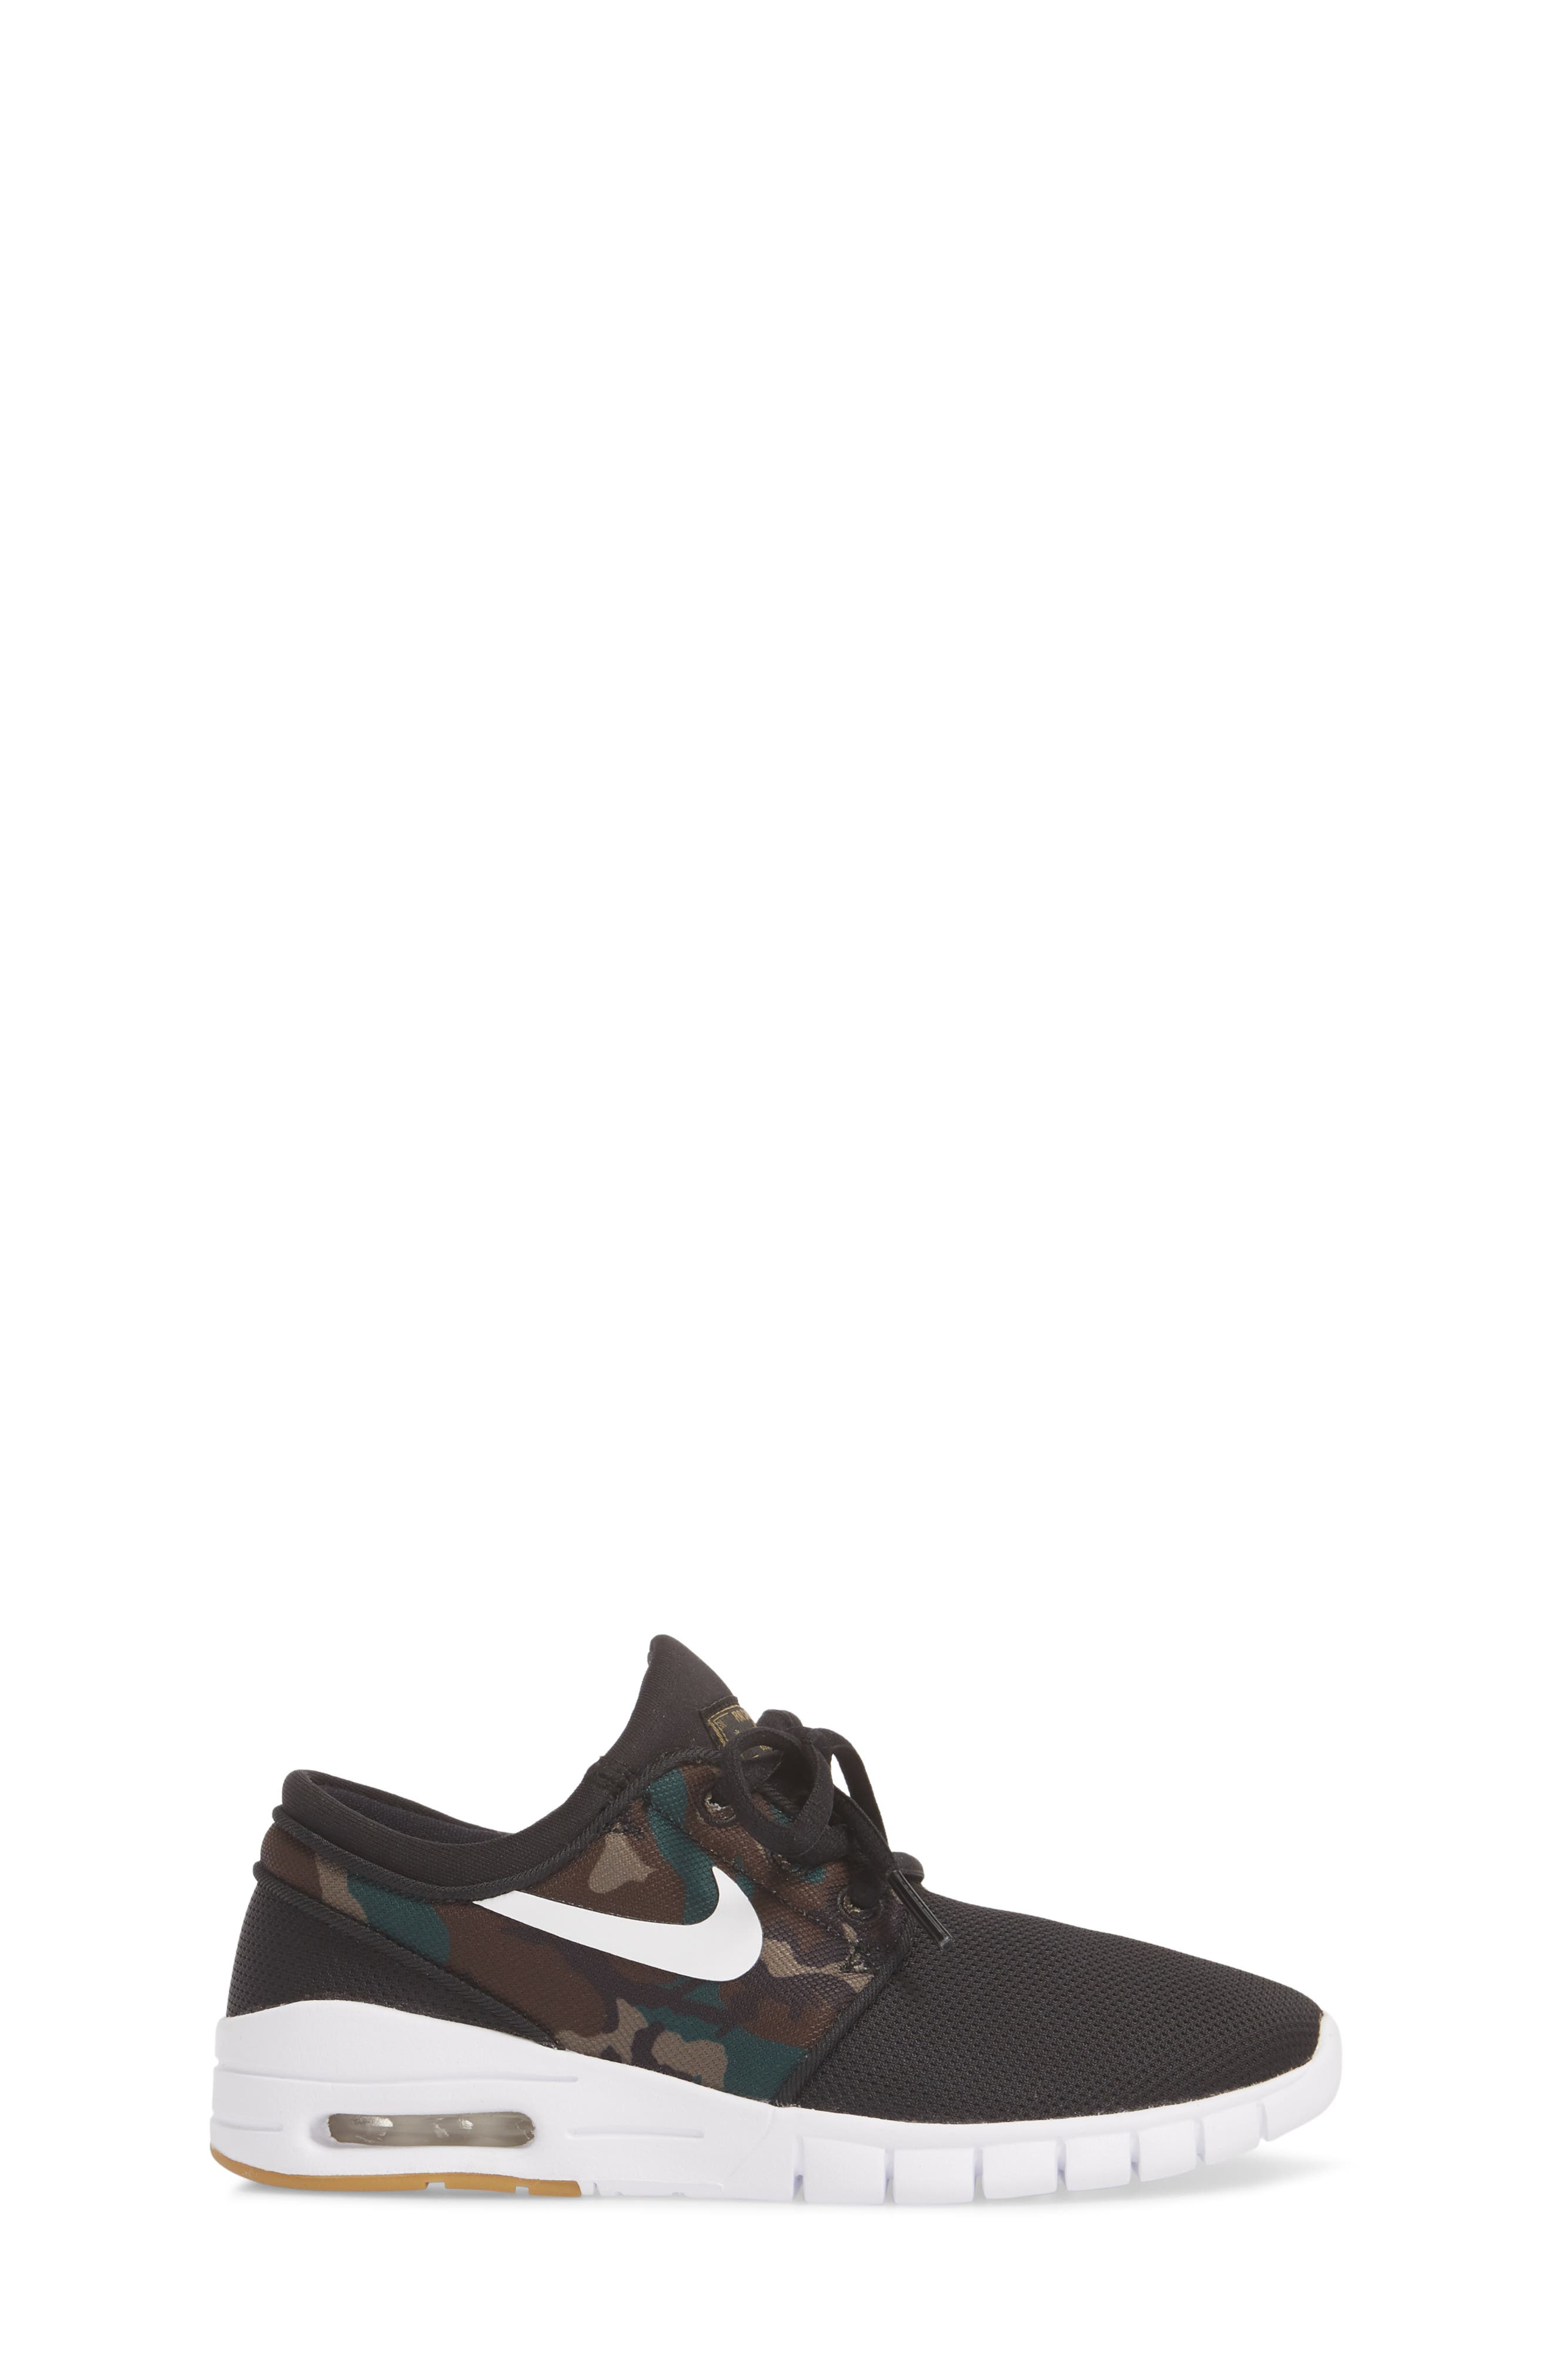 Stefan Janoski Max SB Skate Sneaker,                             Alternate thumbnail 3, color,                             Black/ White/ Olive/ Brown